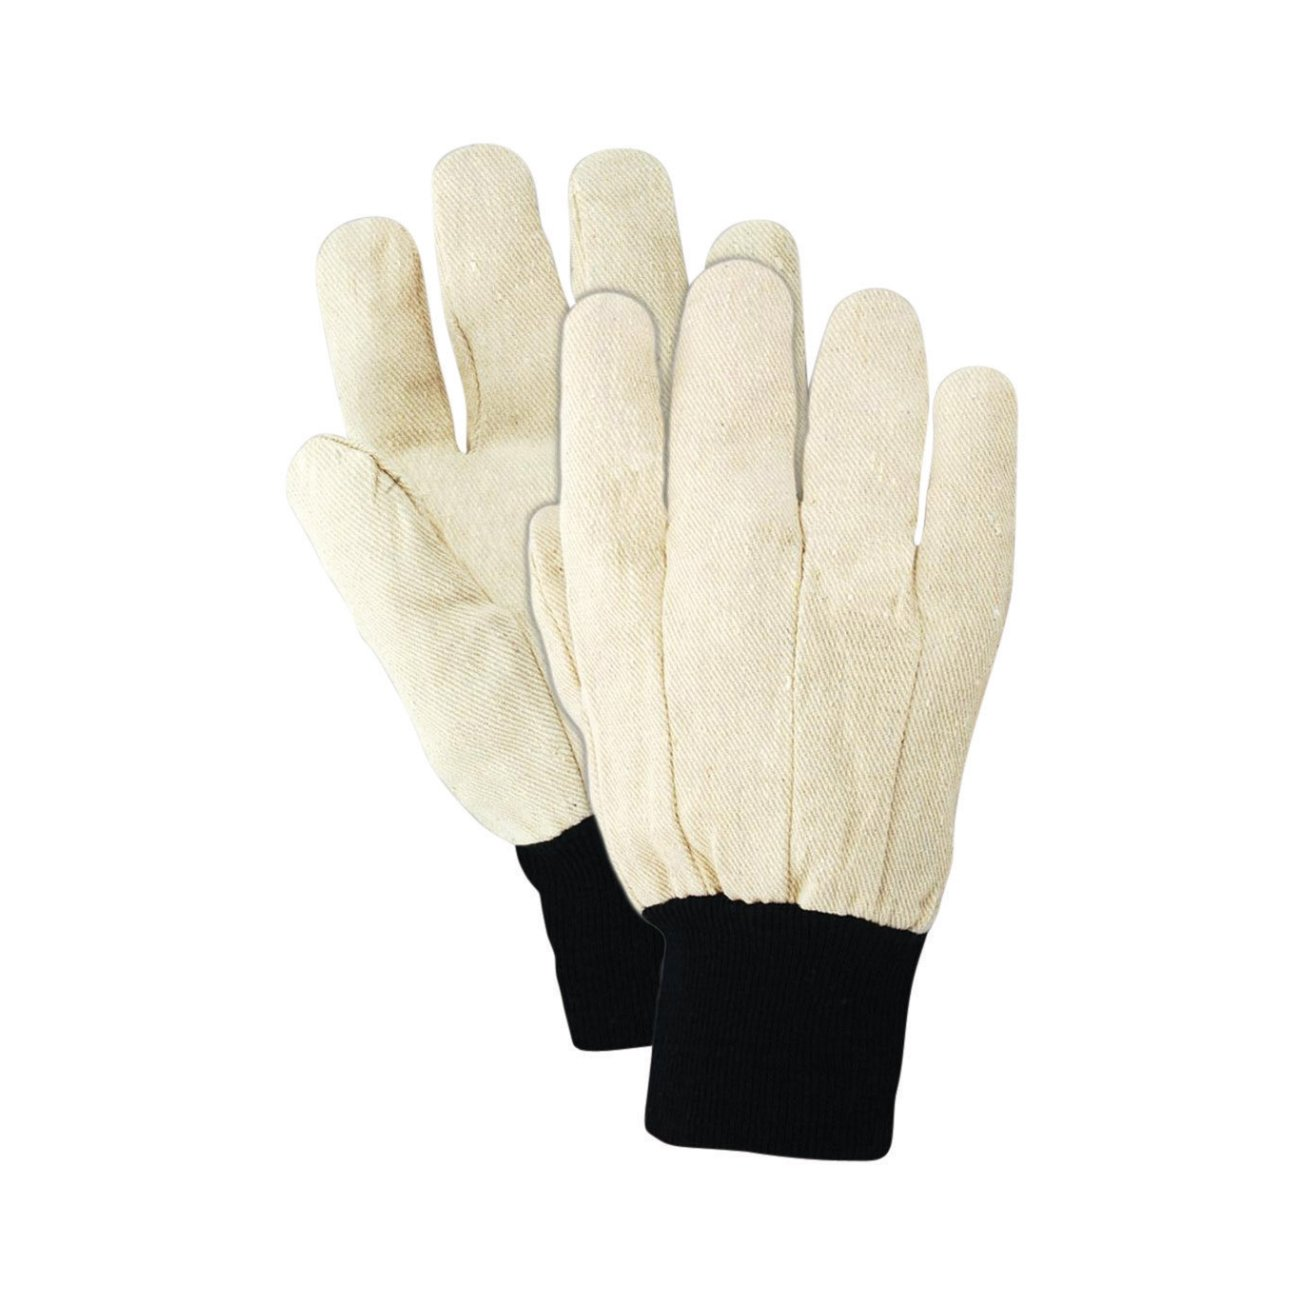 Magid Glove & Safety Mfg Co Ll Glove Canvas Wht Sm Case Of 12, Magid Glove & Safety Mfg Co Ll